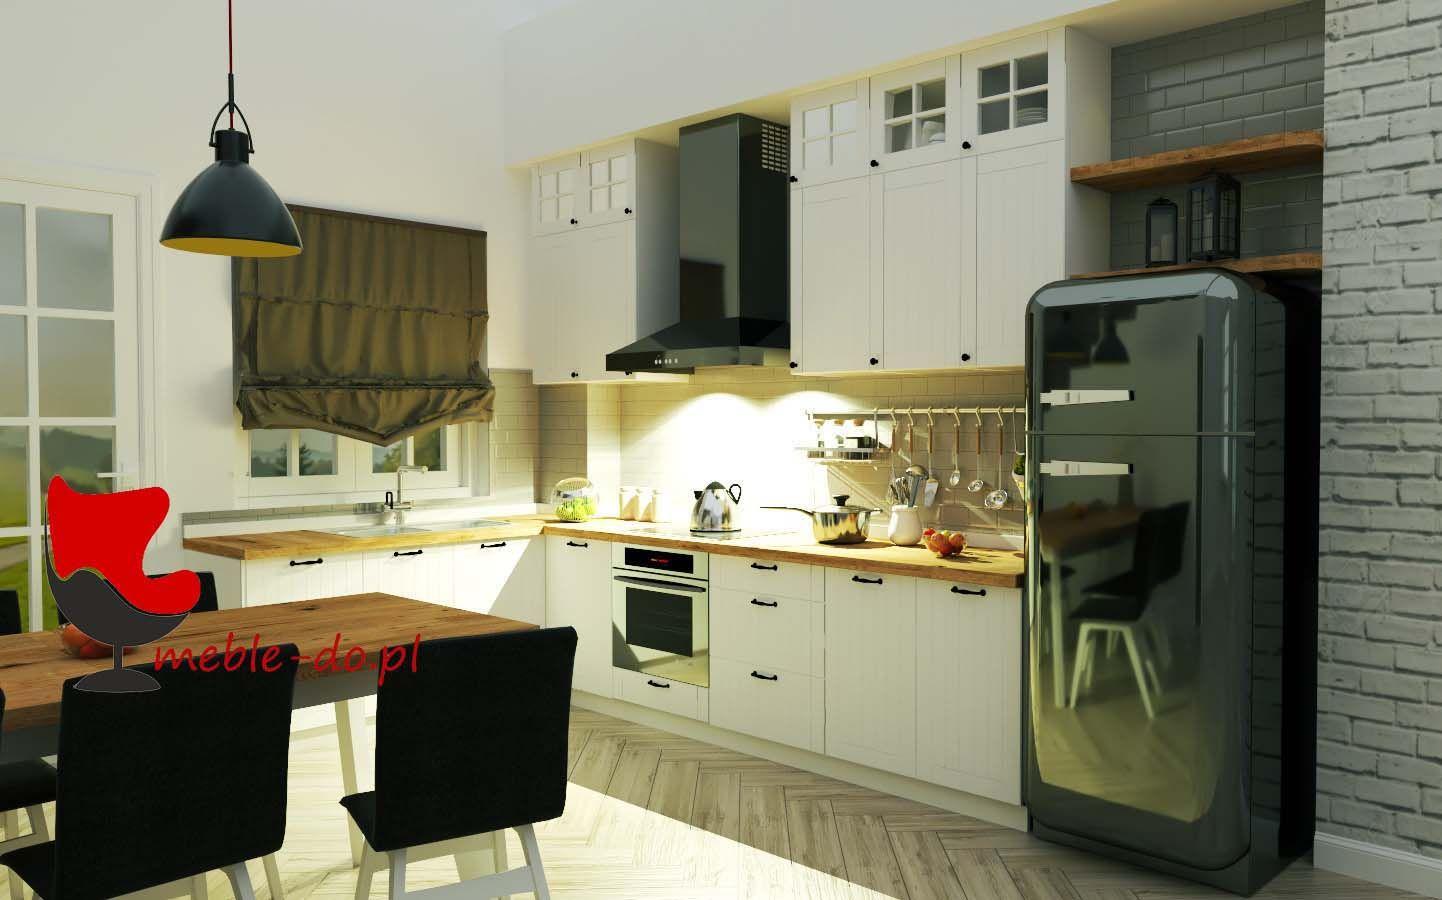 Kuchnia W Zabudowie Pod Sufit Kolekcja Lora Home Decor Kitchen Cabinets Furniture